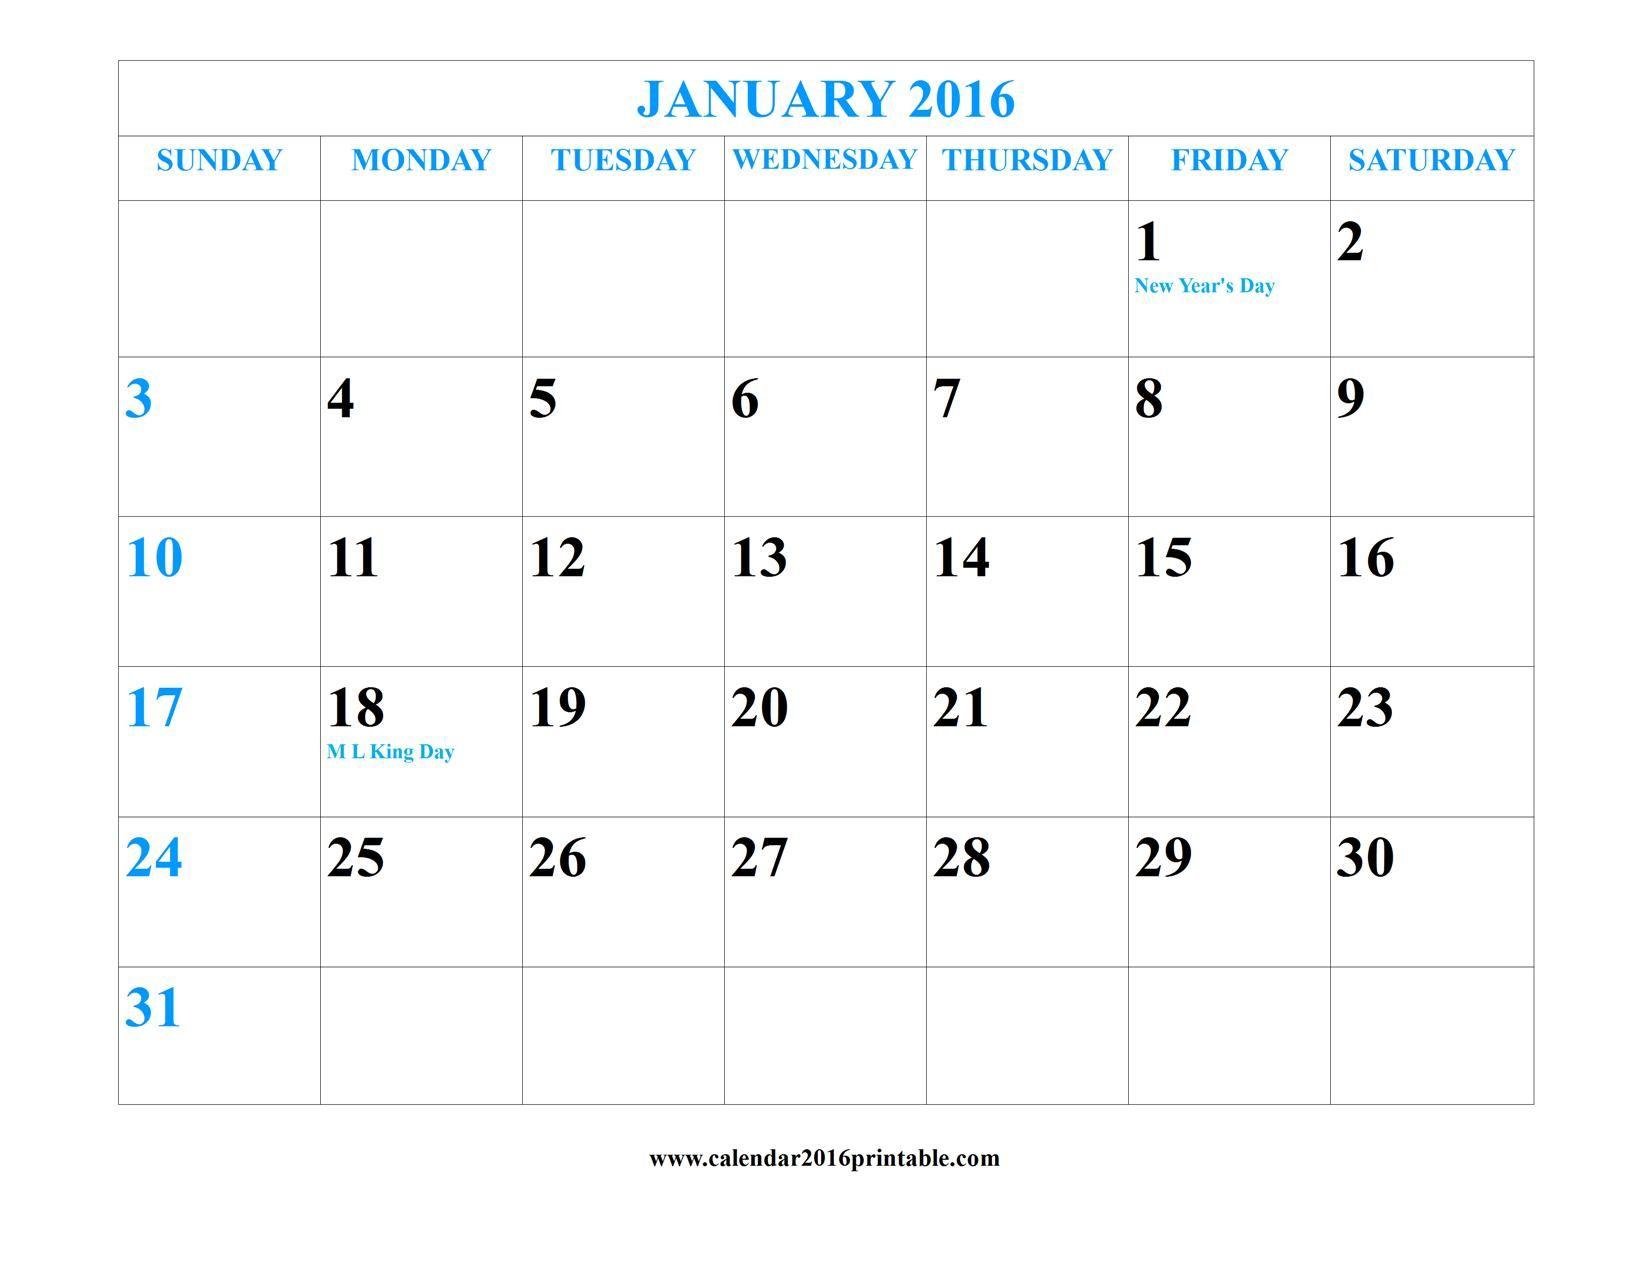 January 2016 Calendar Printable With Holidays, Free To intended for July 2016 Calendar With Holidays